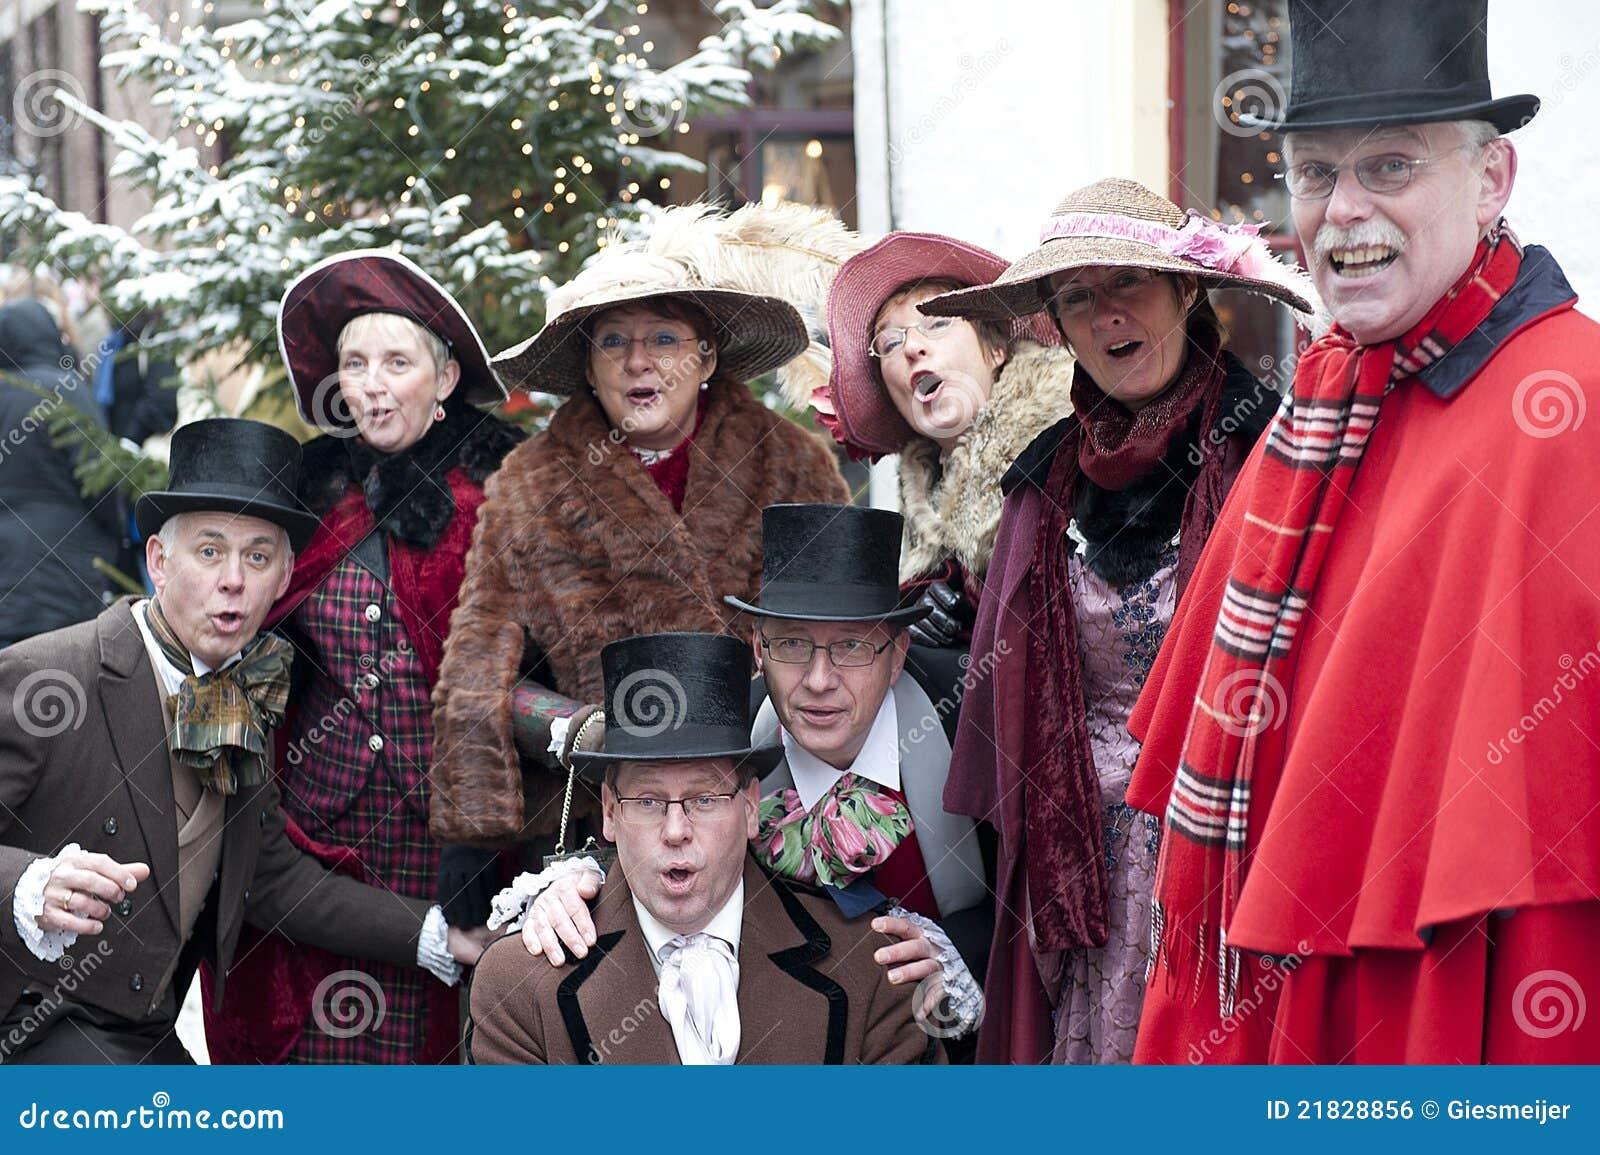 Choir in the victorian age